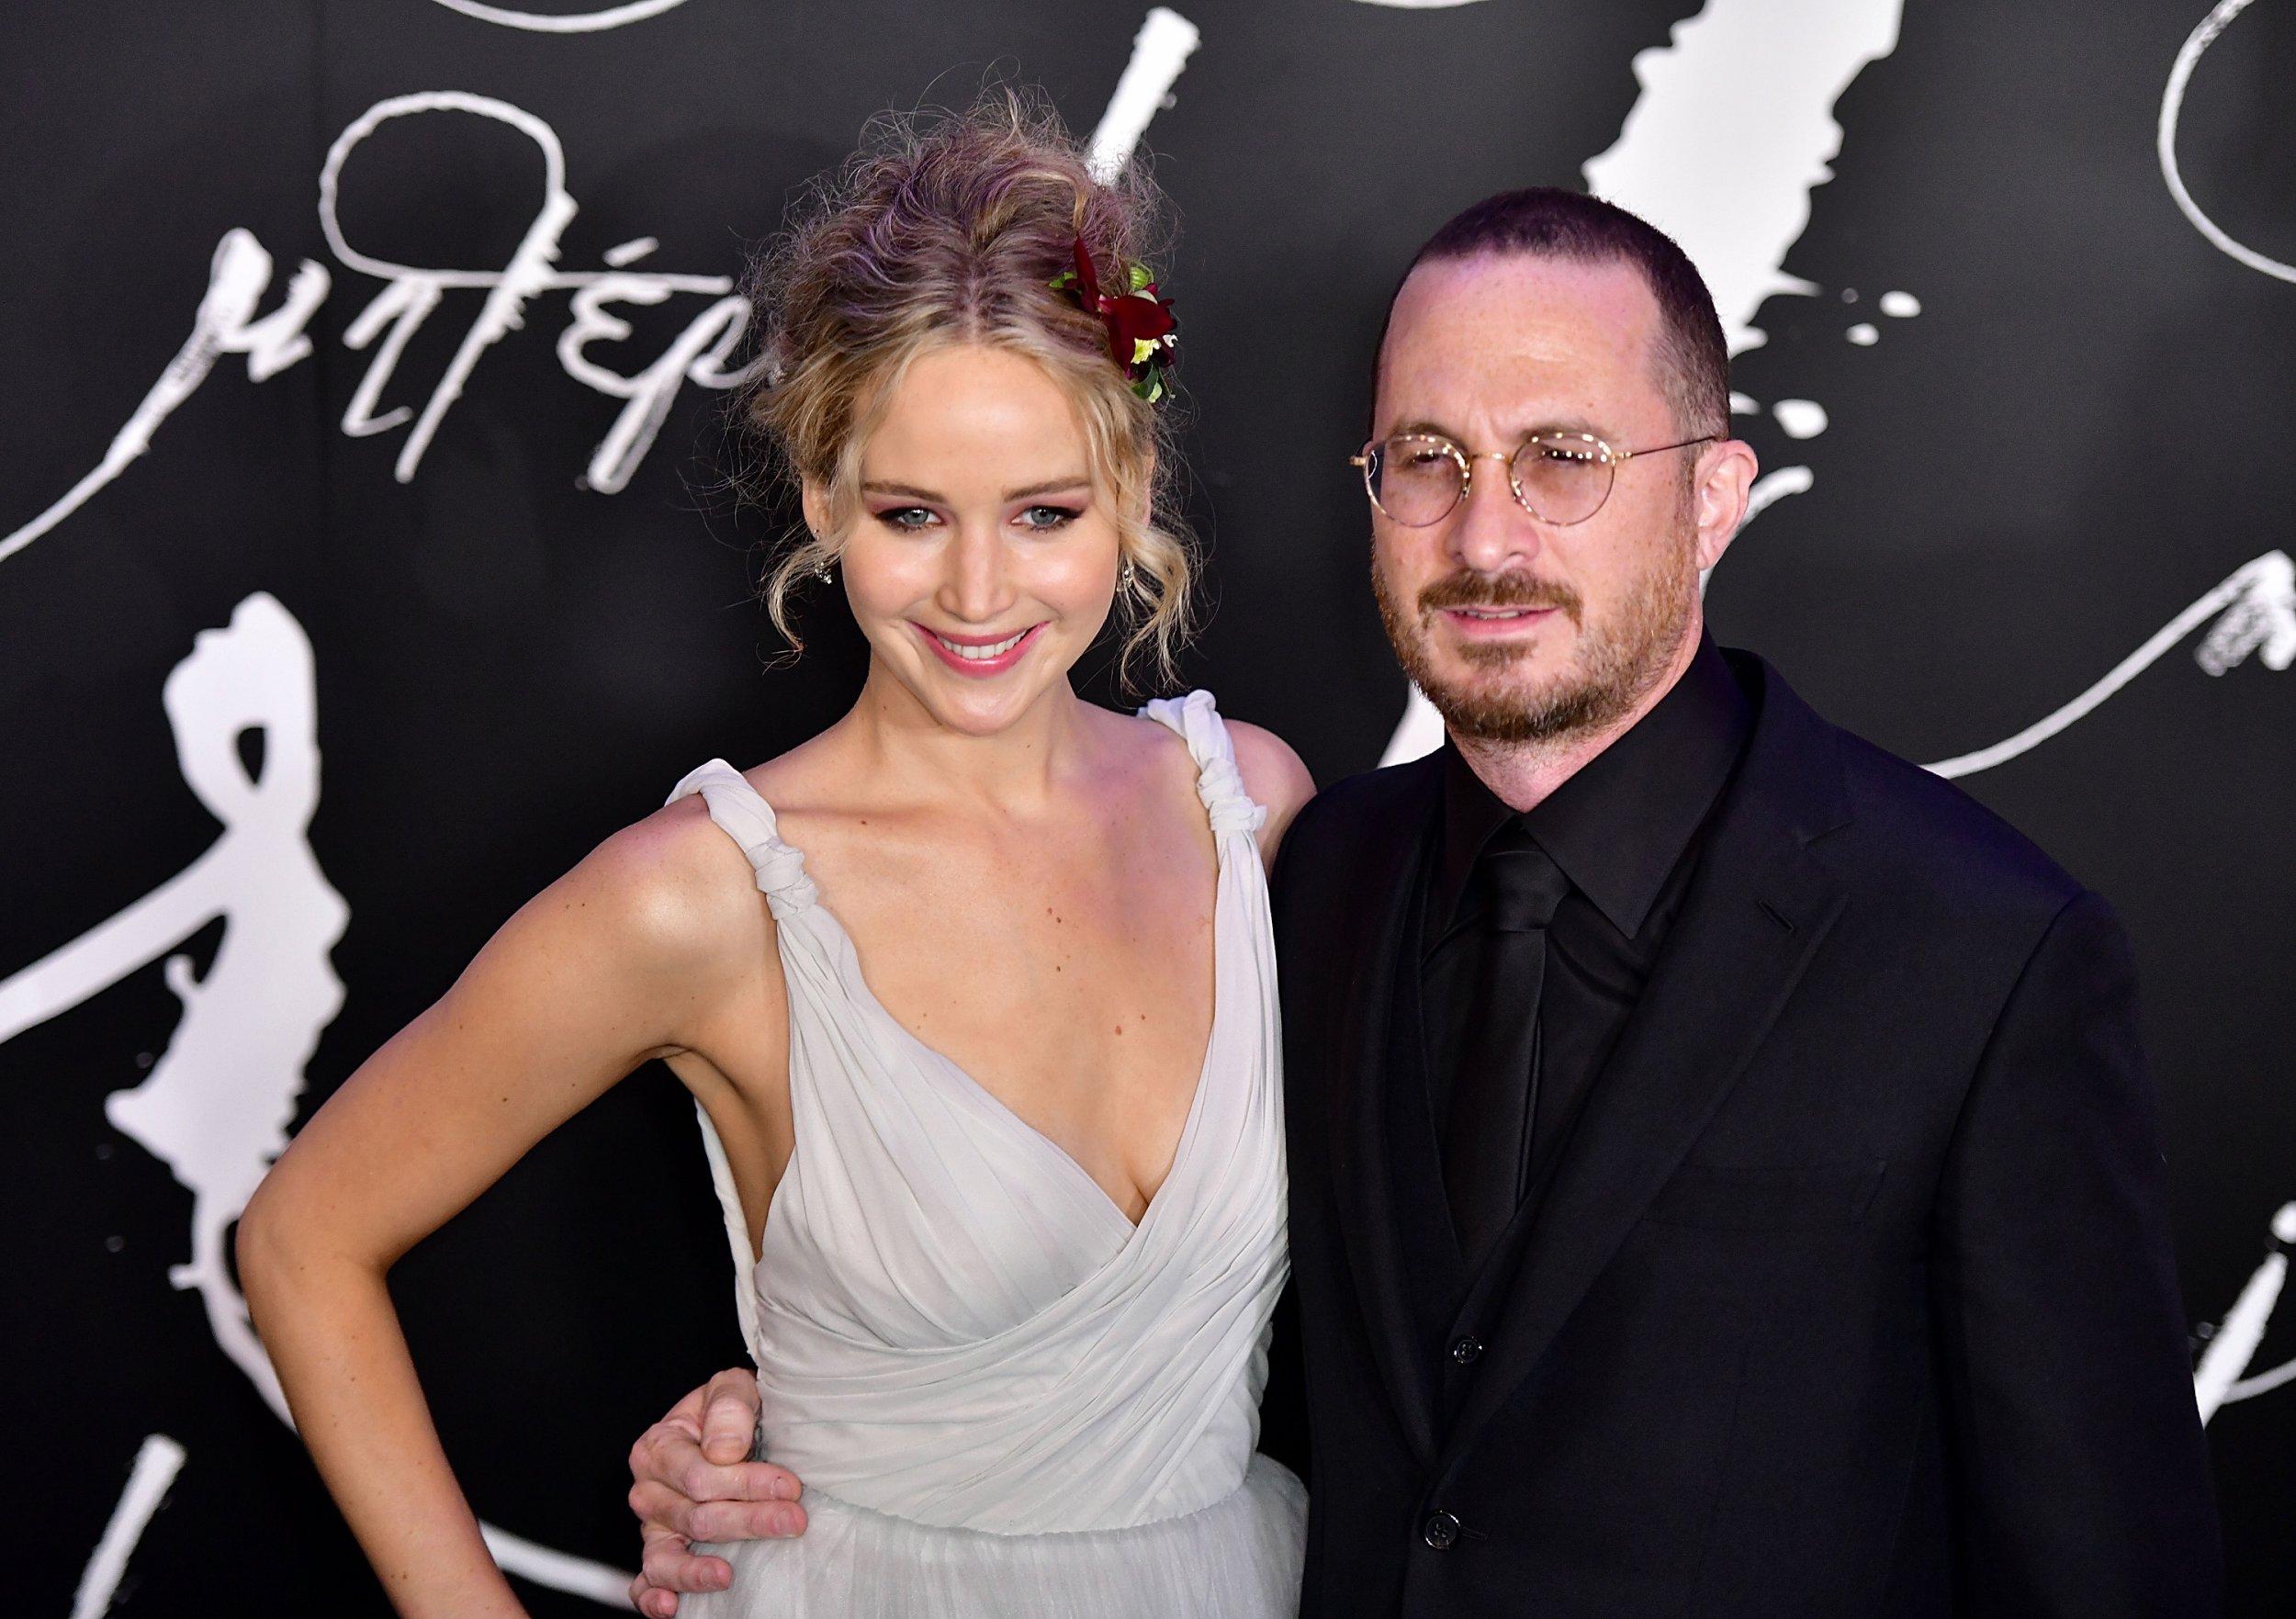 Jennifer Lawrence's ex Darren Aronofsky says she was 'emotionally overwhelmed' filming Mother!